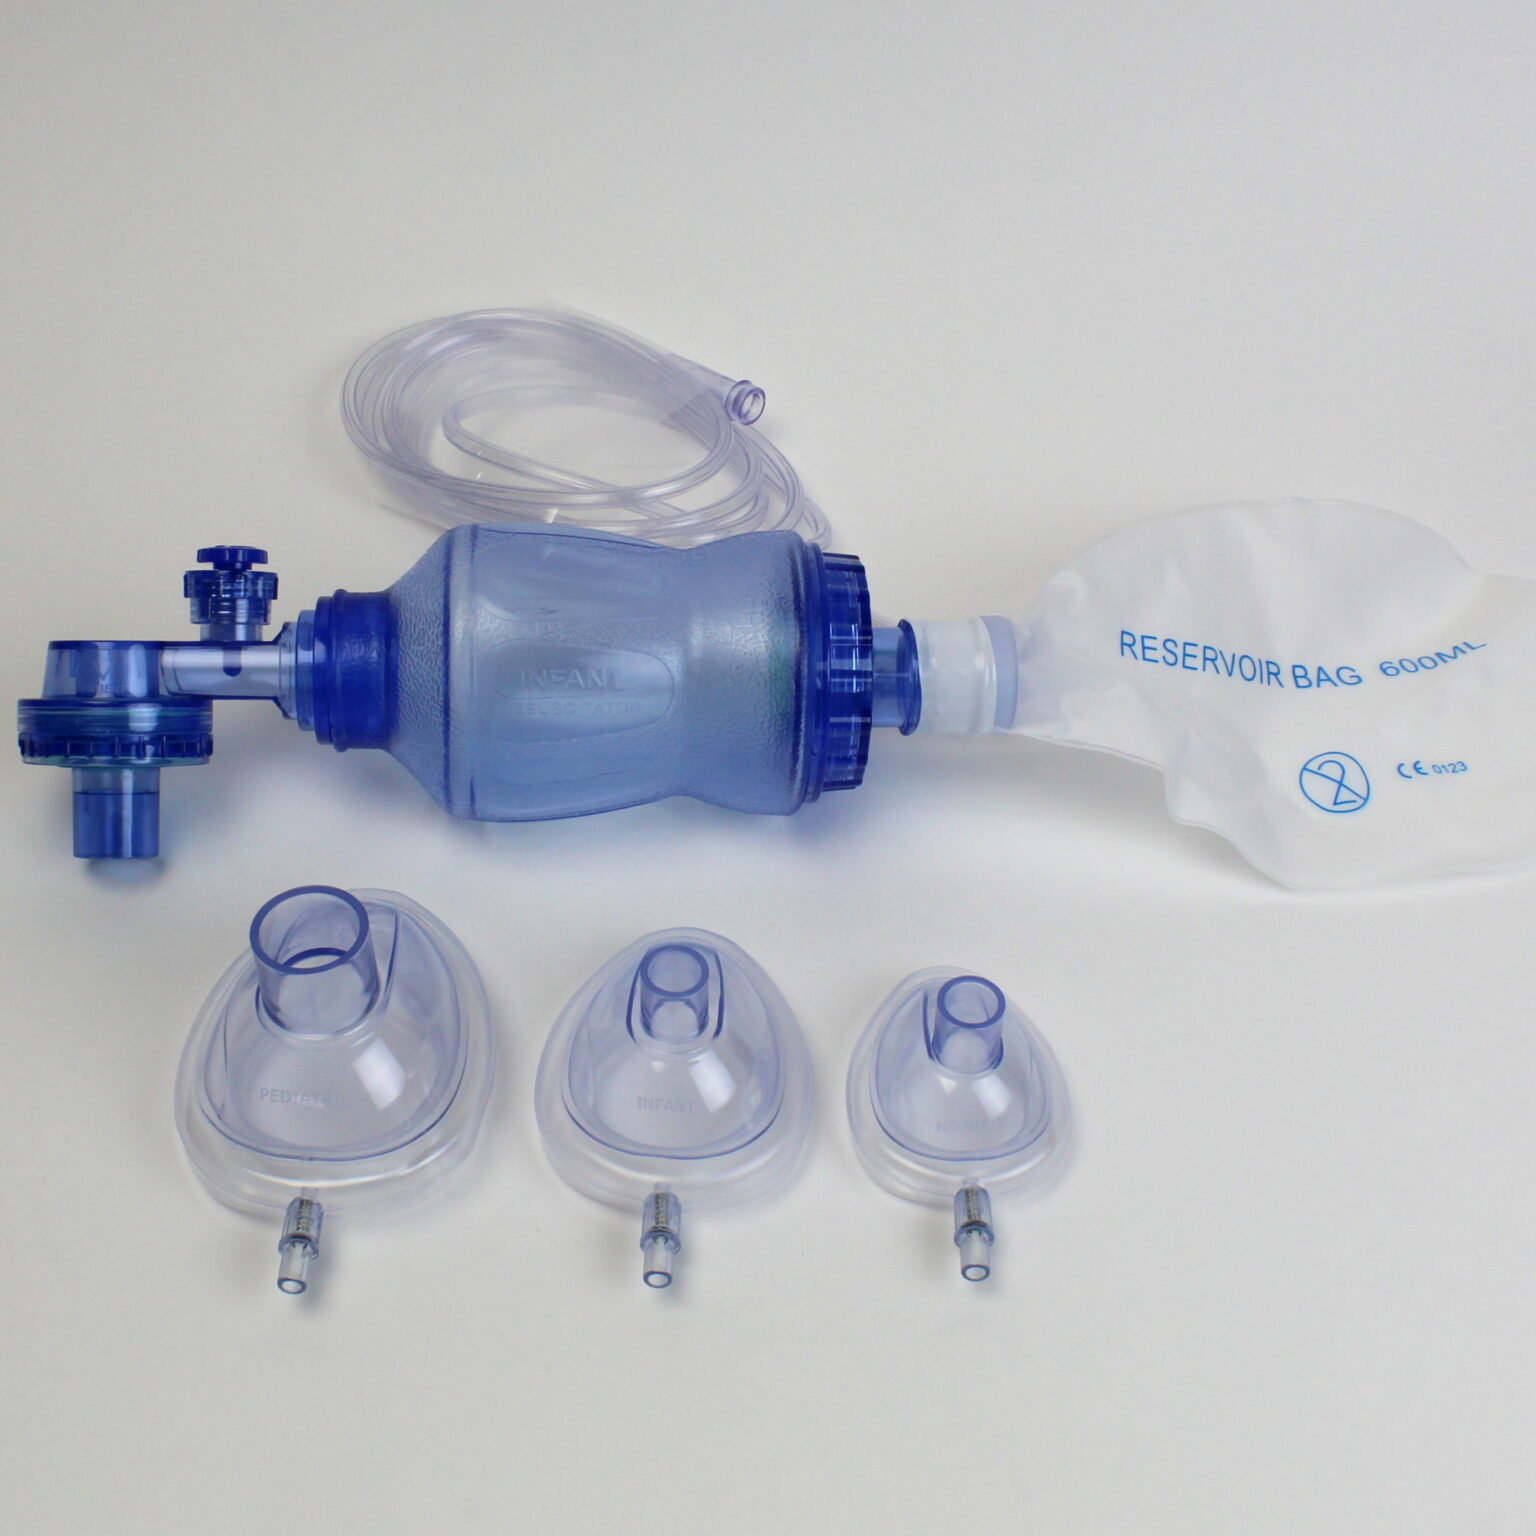 Disposable BVM (Bag Valve Mask)